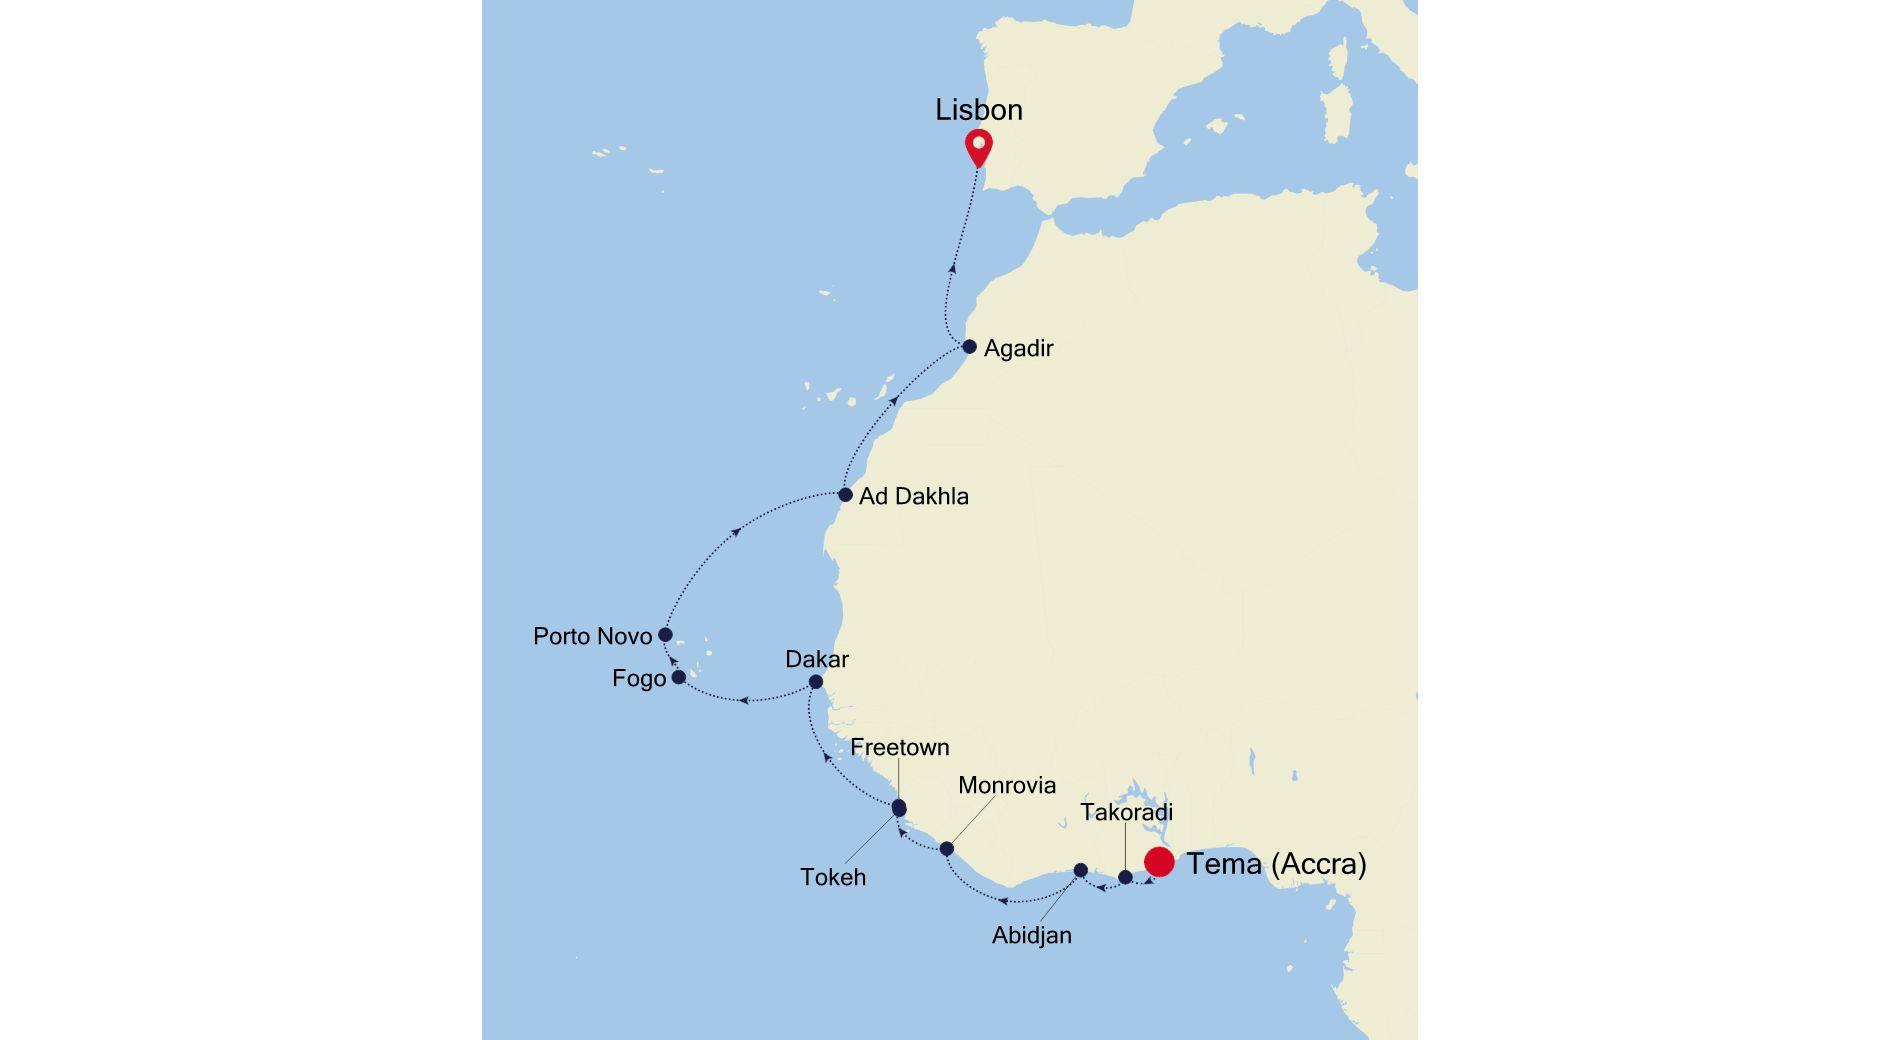 WI210417018 - Tema to Lisbon